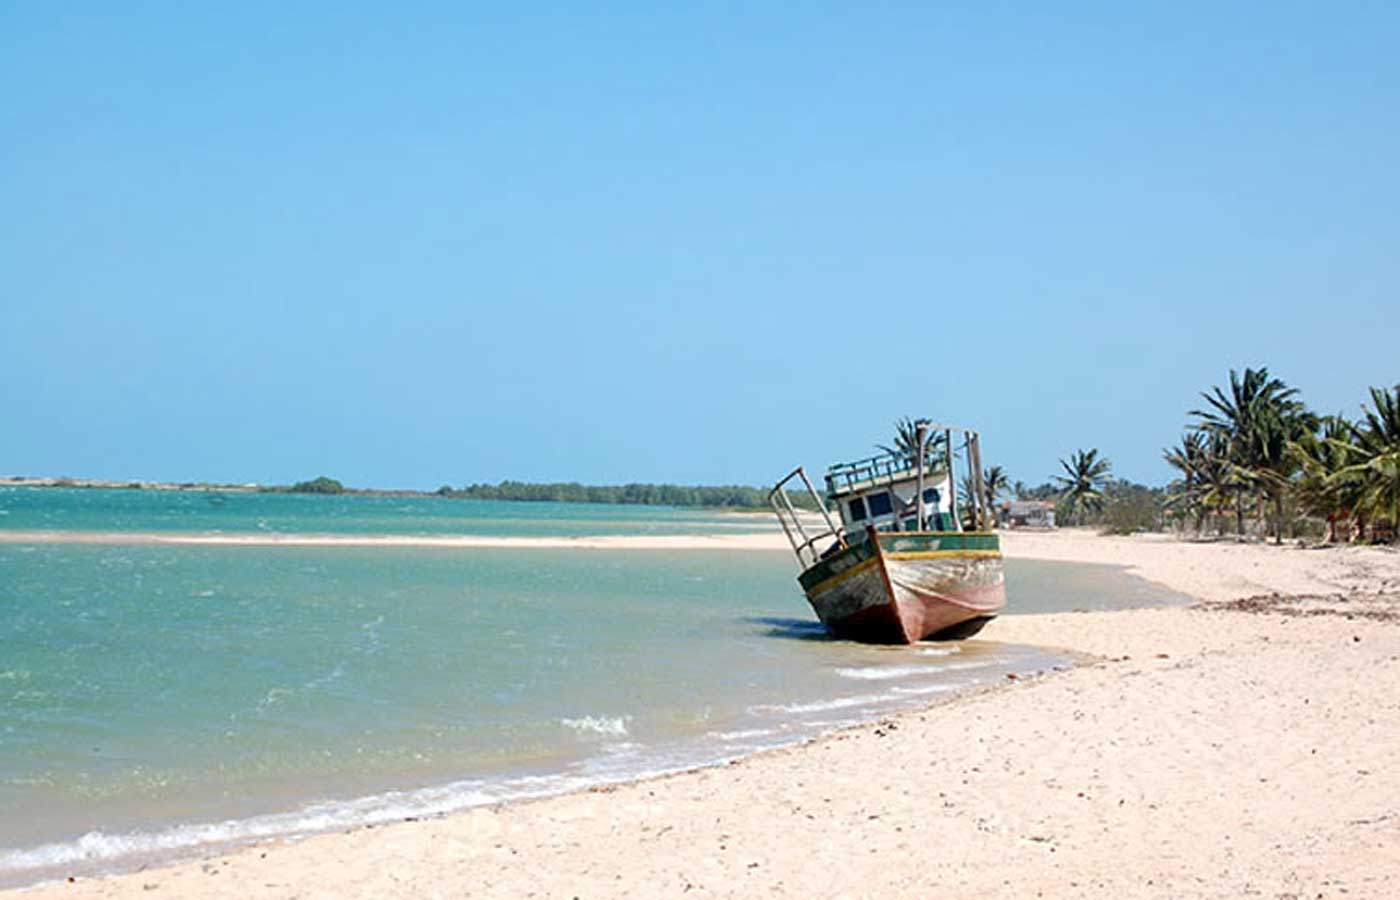 Guajiru beach in Fortaleza, Brazil